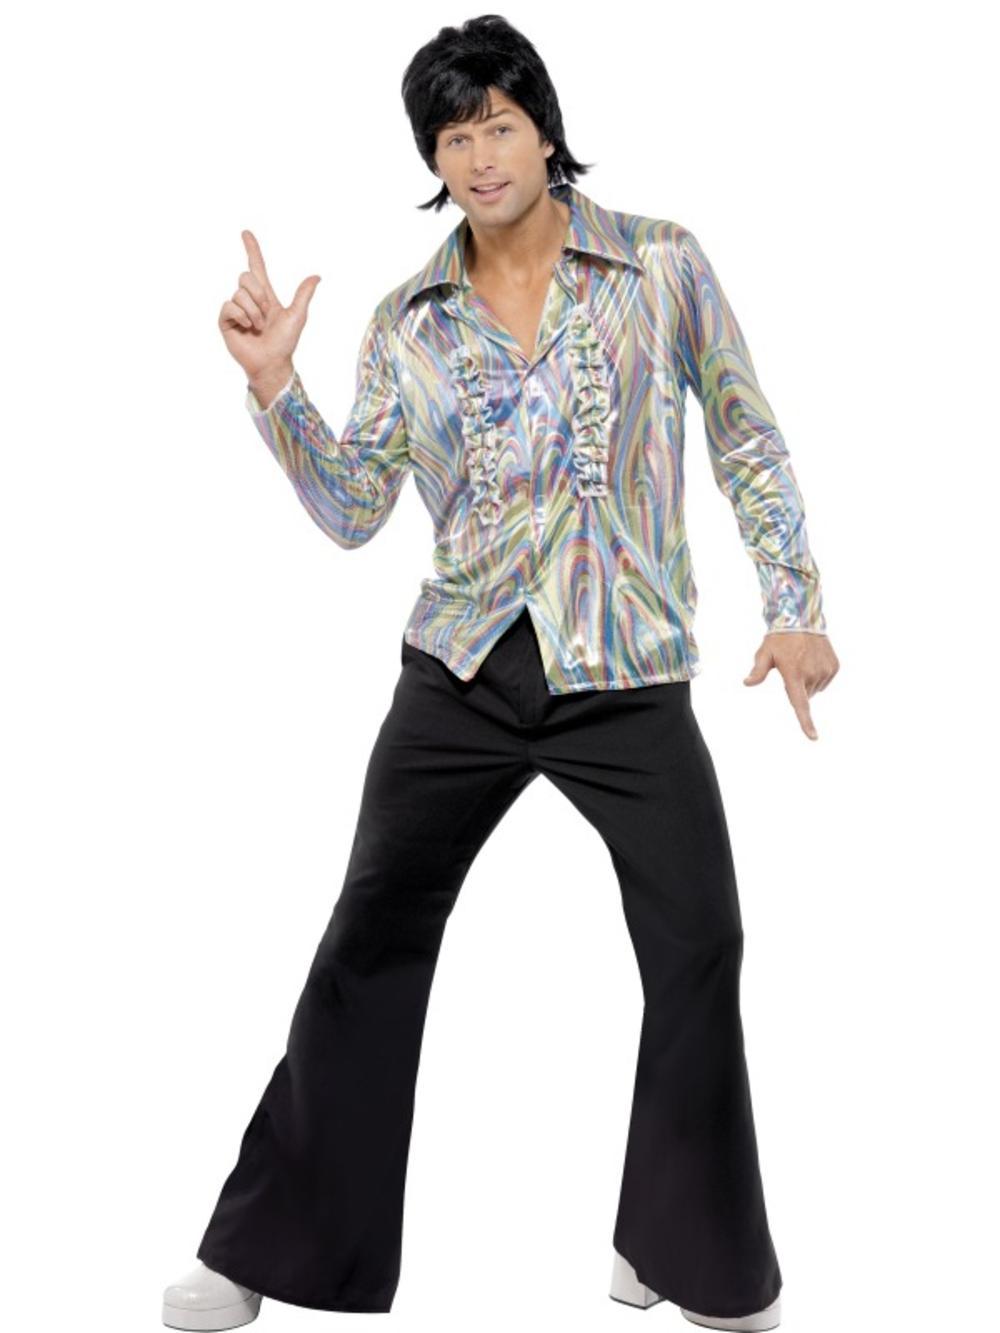 70's Retro Men's Fancy Dress 70s Costume Adult 1970s Funky Shirt + Black Flares